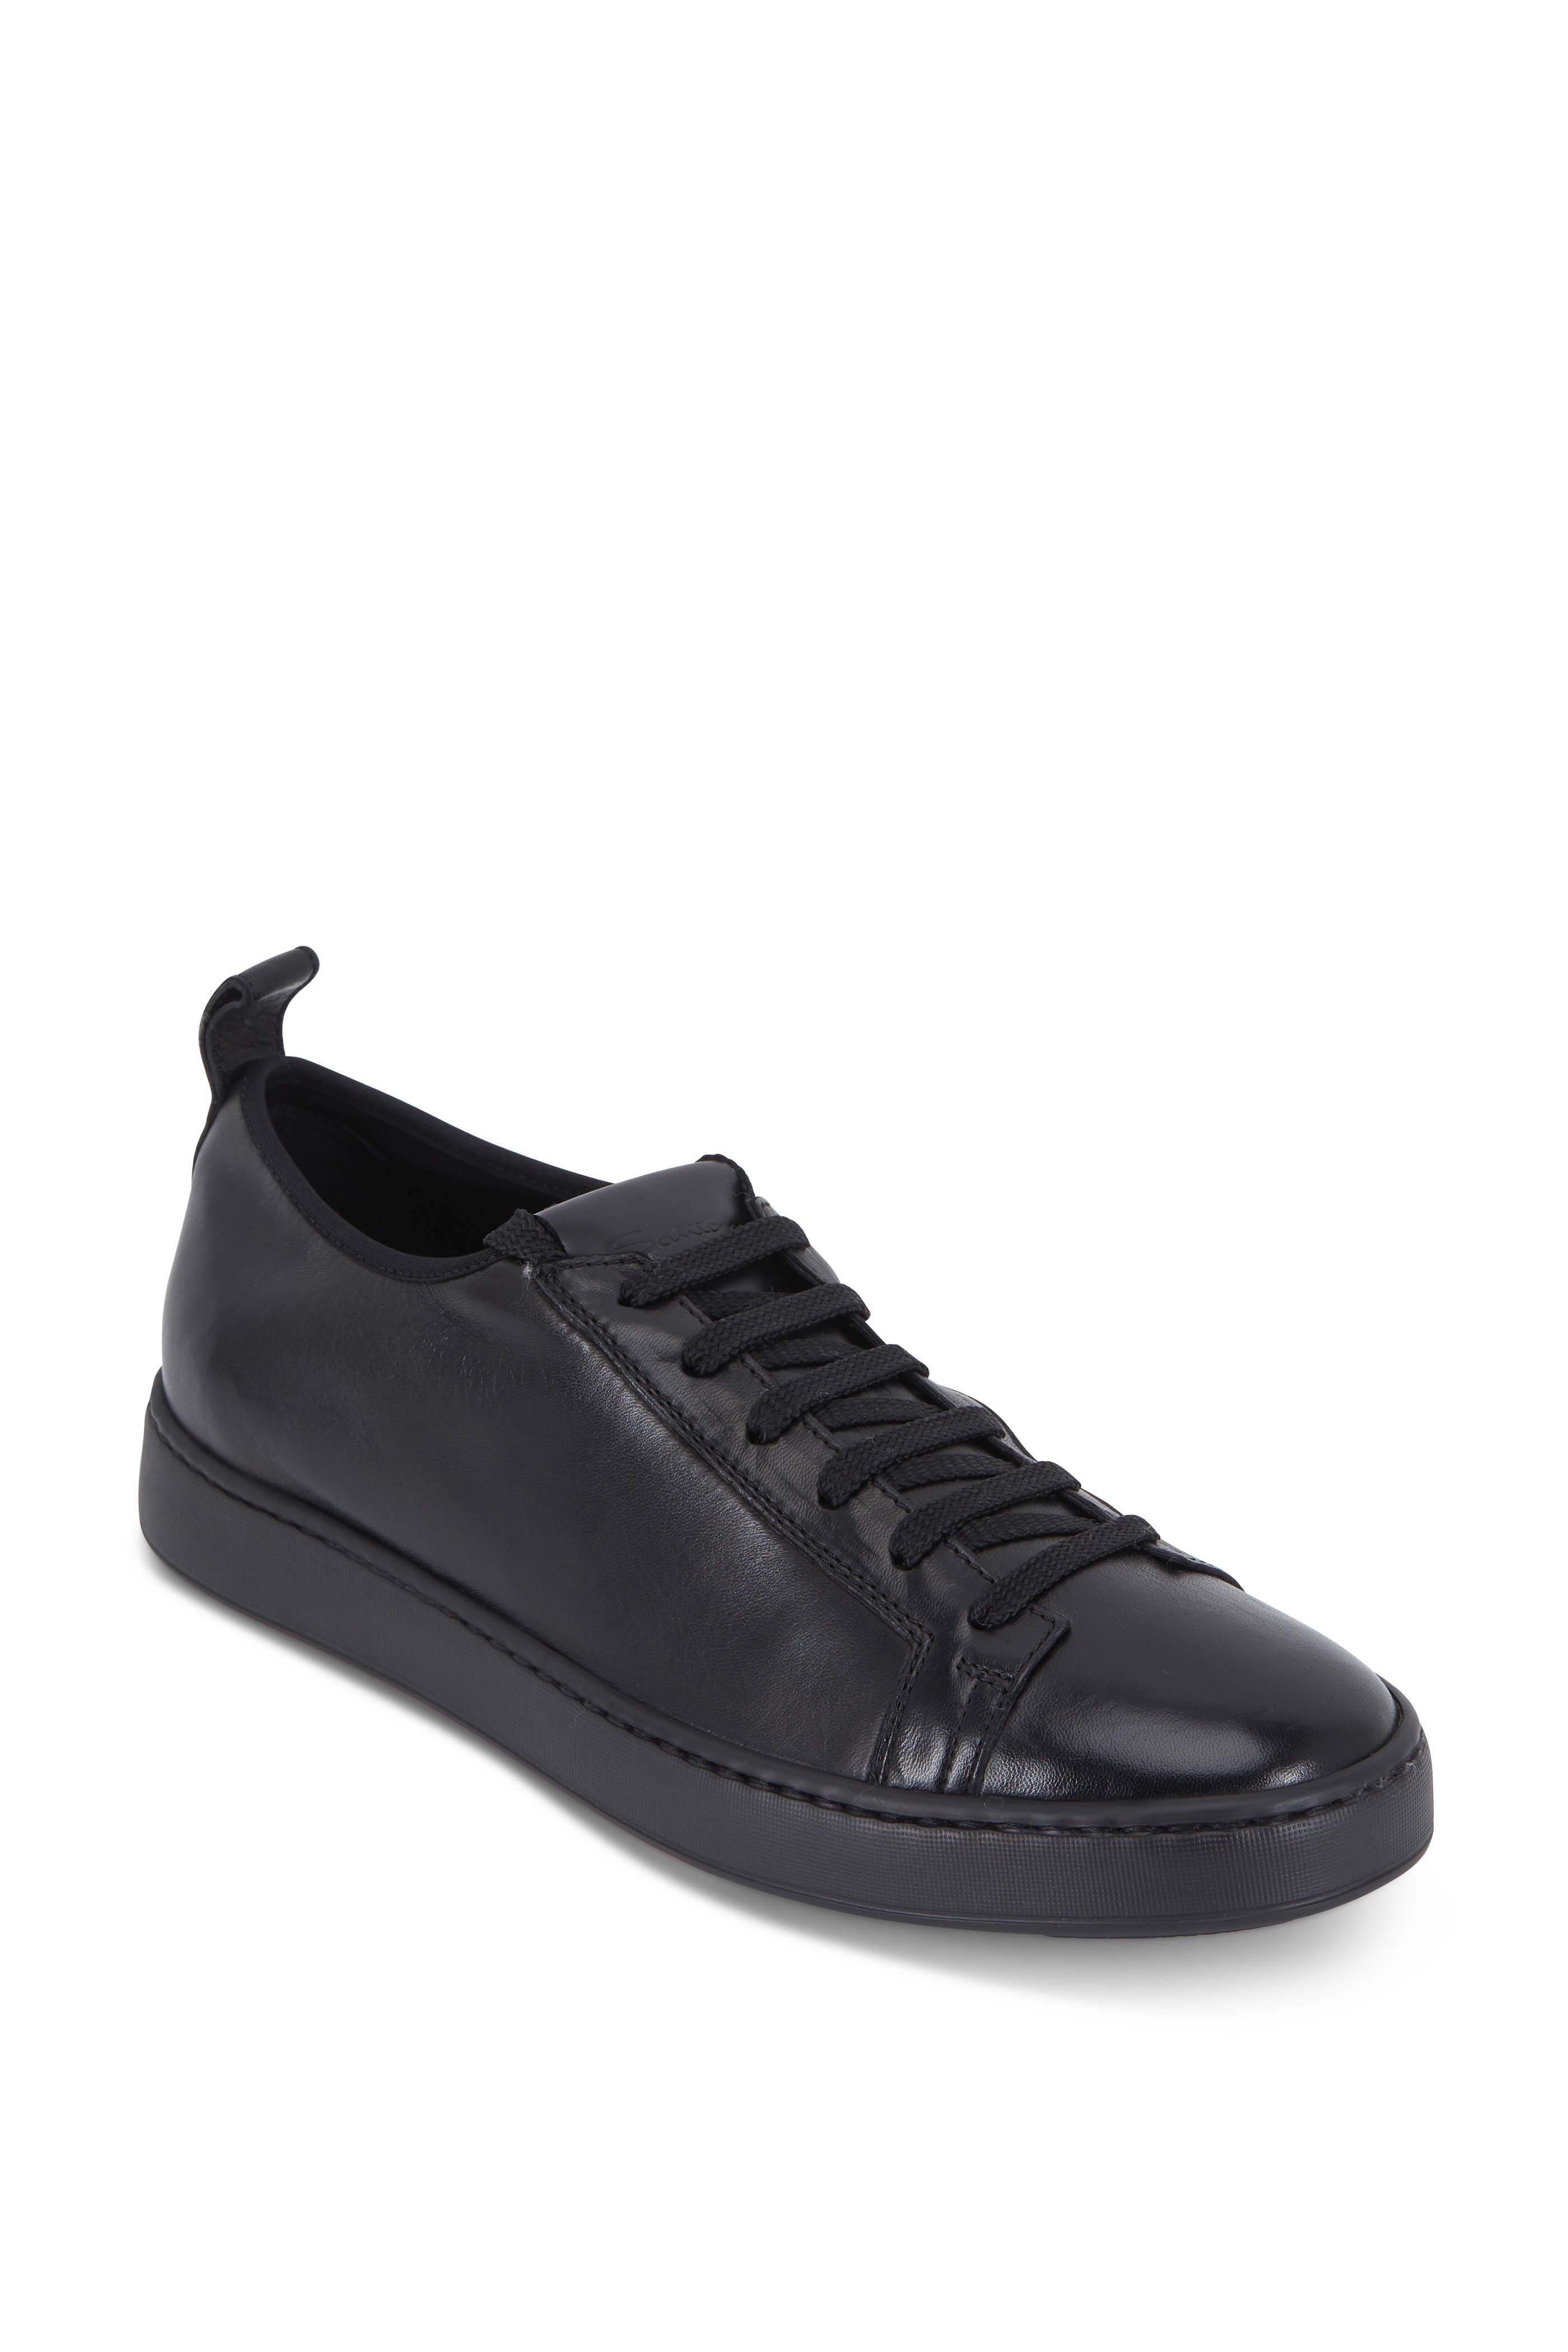 22d431985e Santoni - Black Nappa Leather Soft Low-Top Sneaker   Mitchell Stores